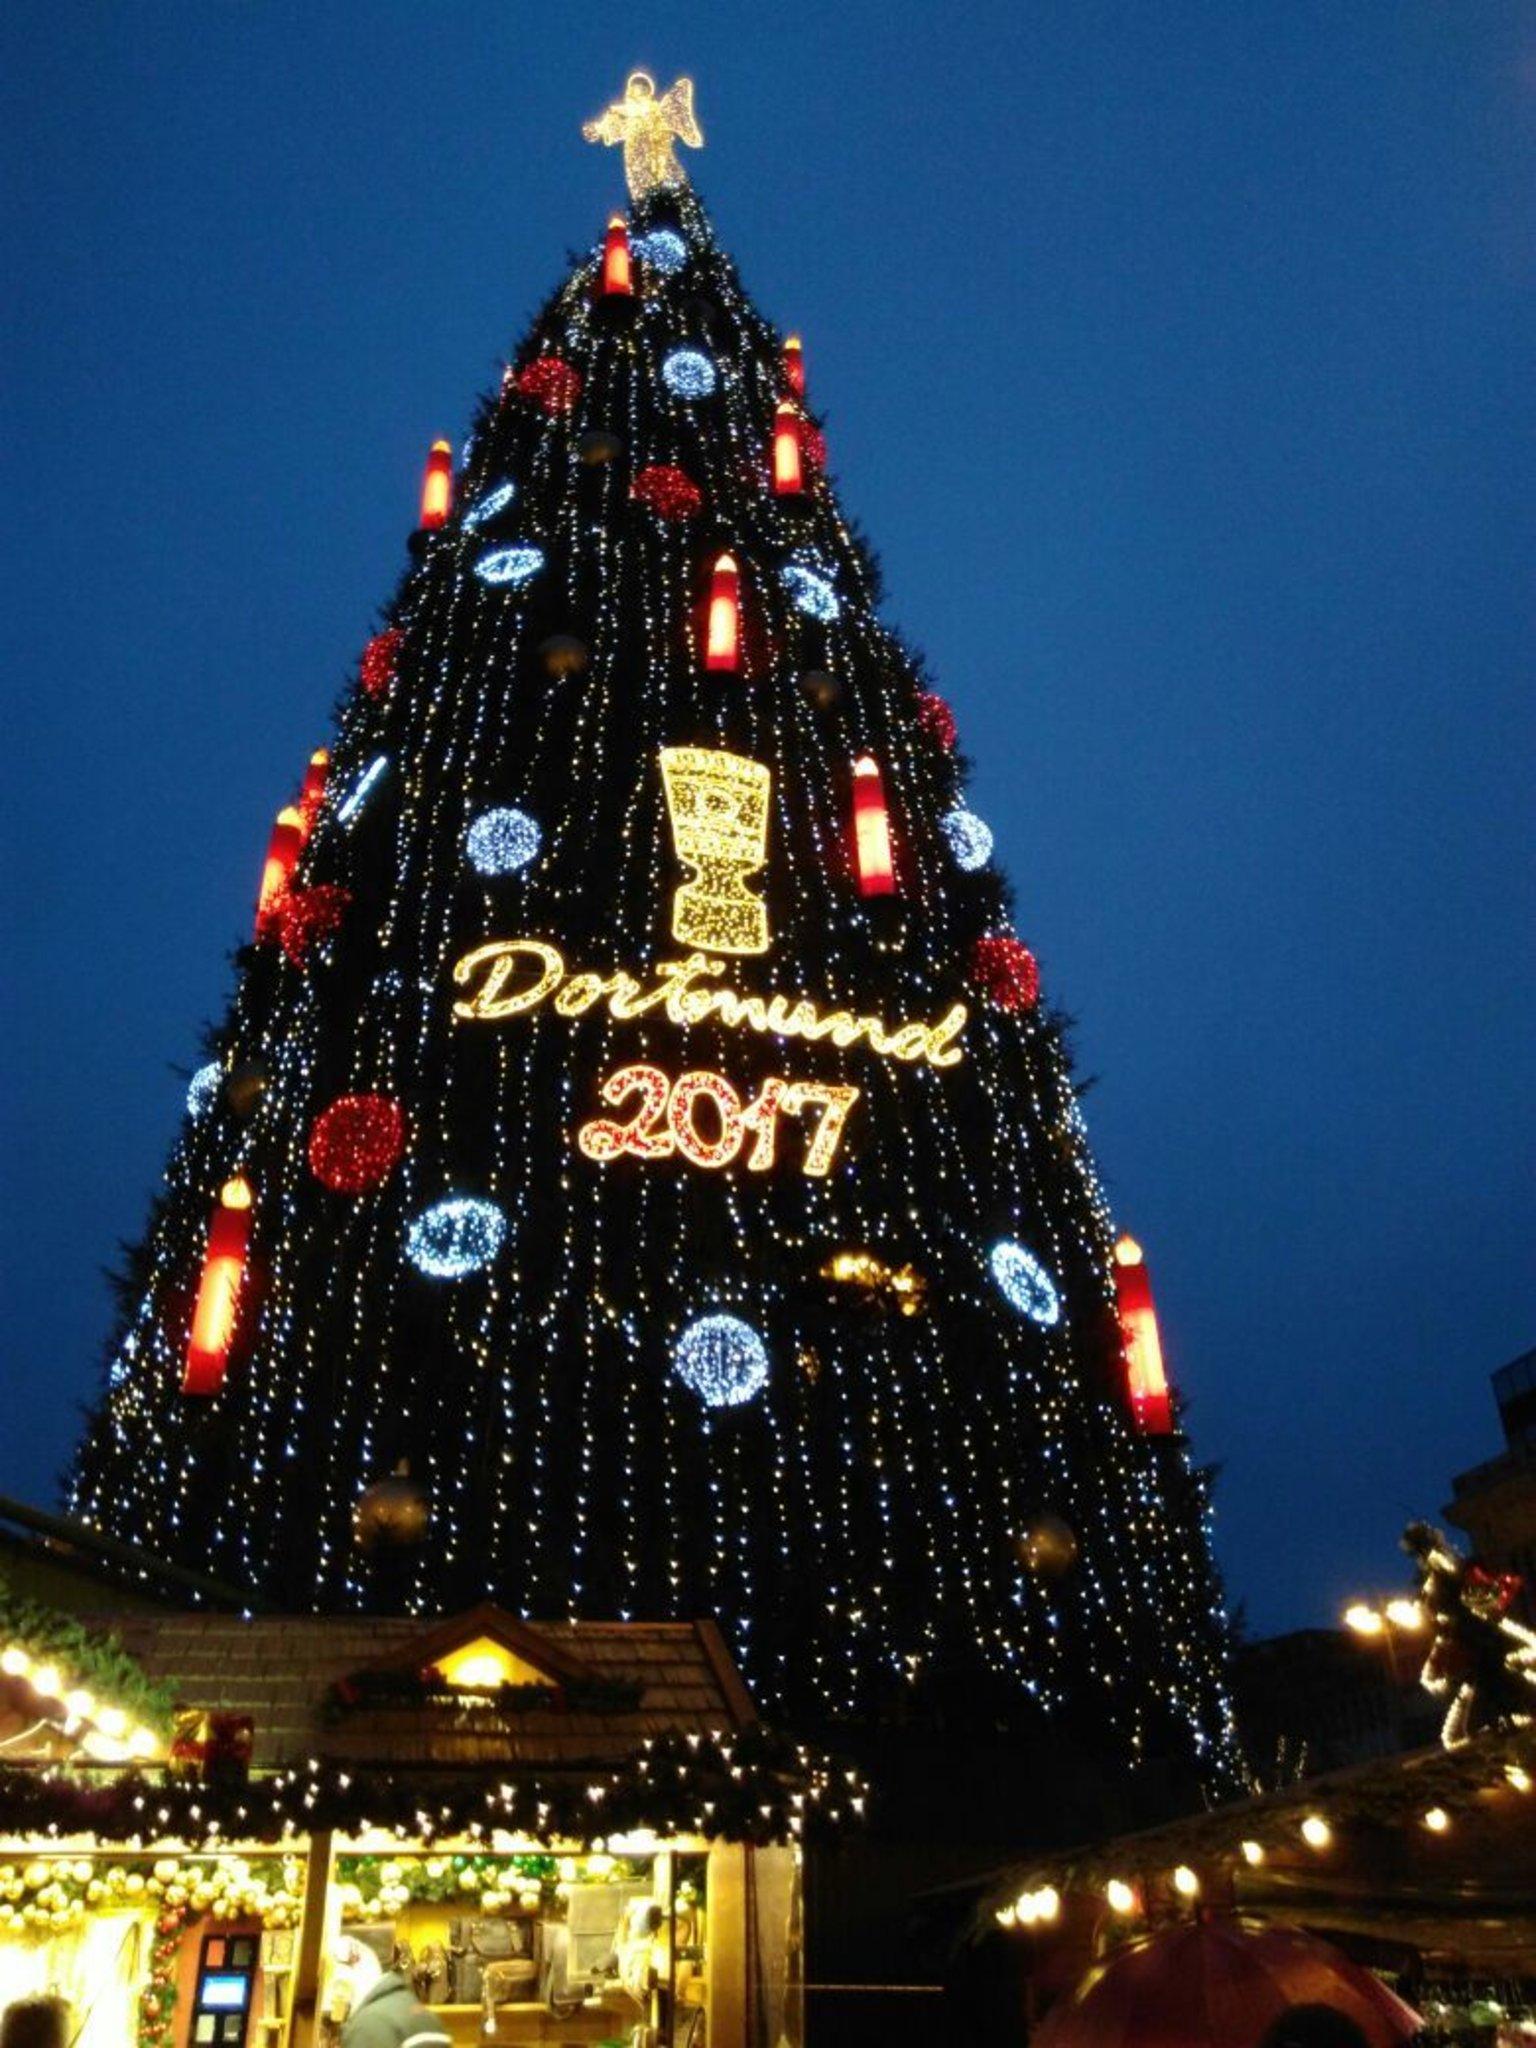 Dortmund Weihnachtsbaum.Weihnachtsbaum Dortmund